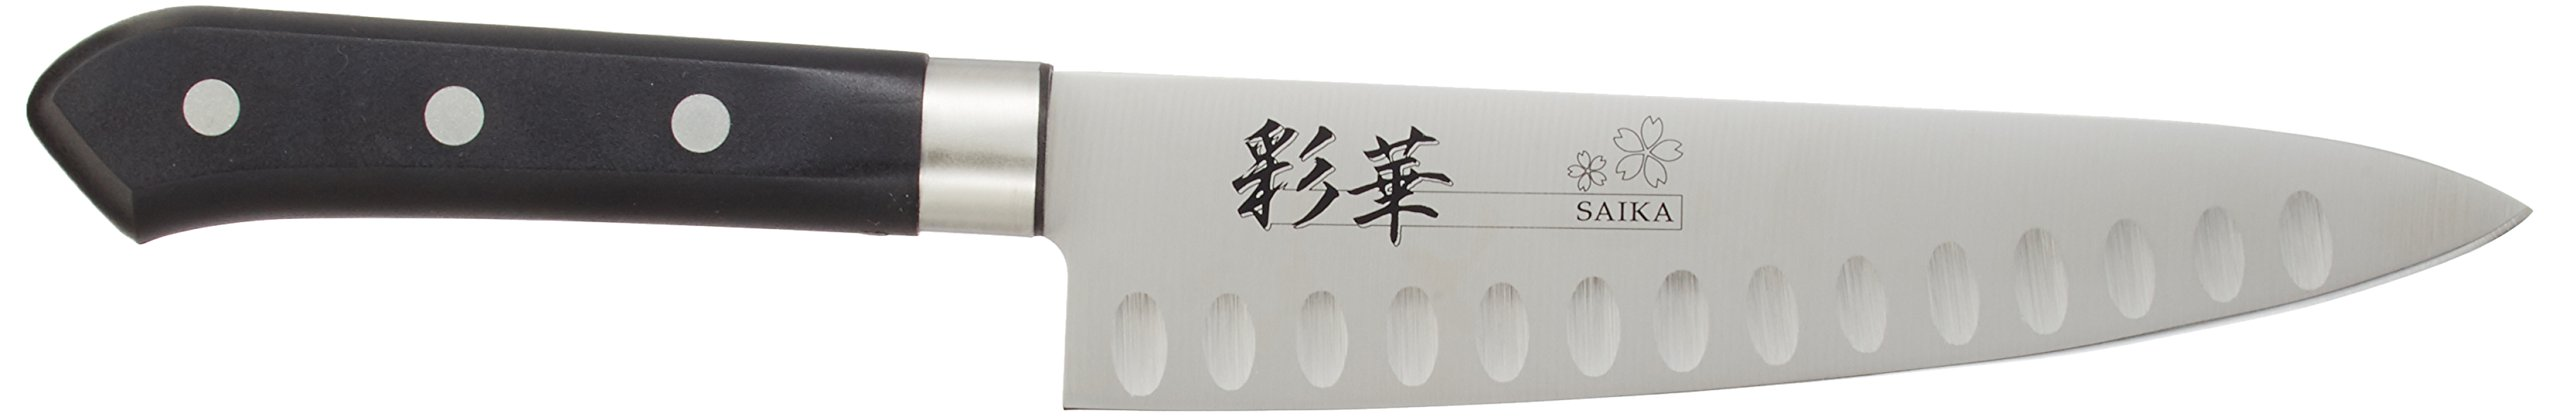 Fuji cutlery Ayaka dimpled knife Gyuto knife 180mm FC-802